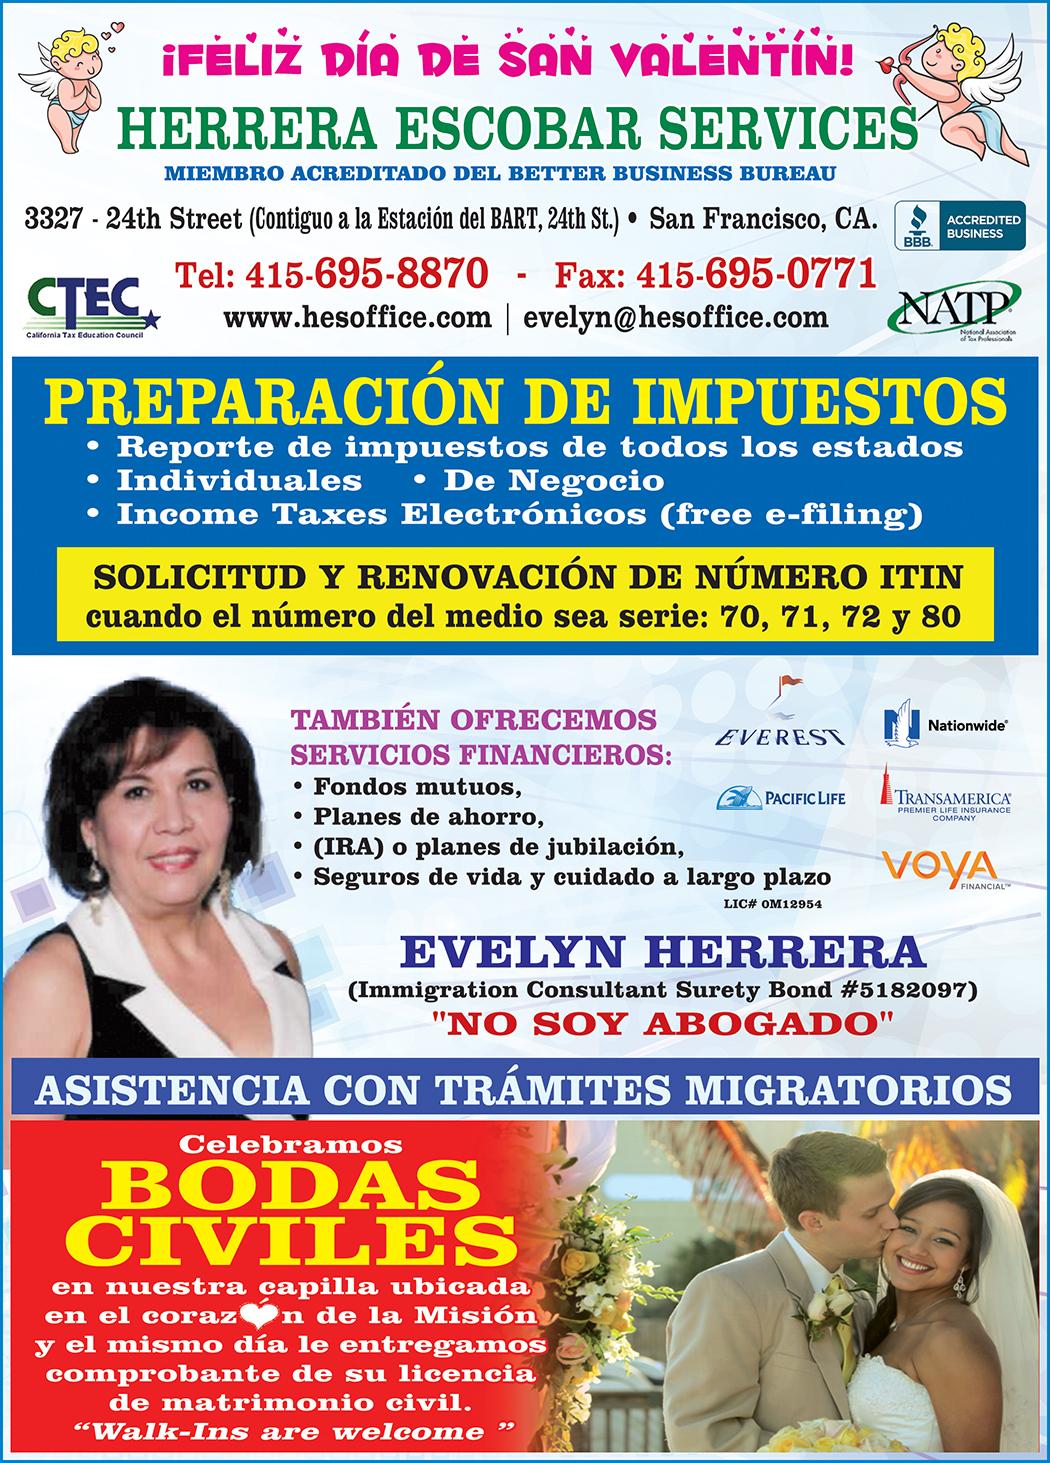 Herrera Escobar 1 Pag - FEBRERO 2018.jpg